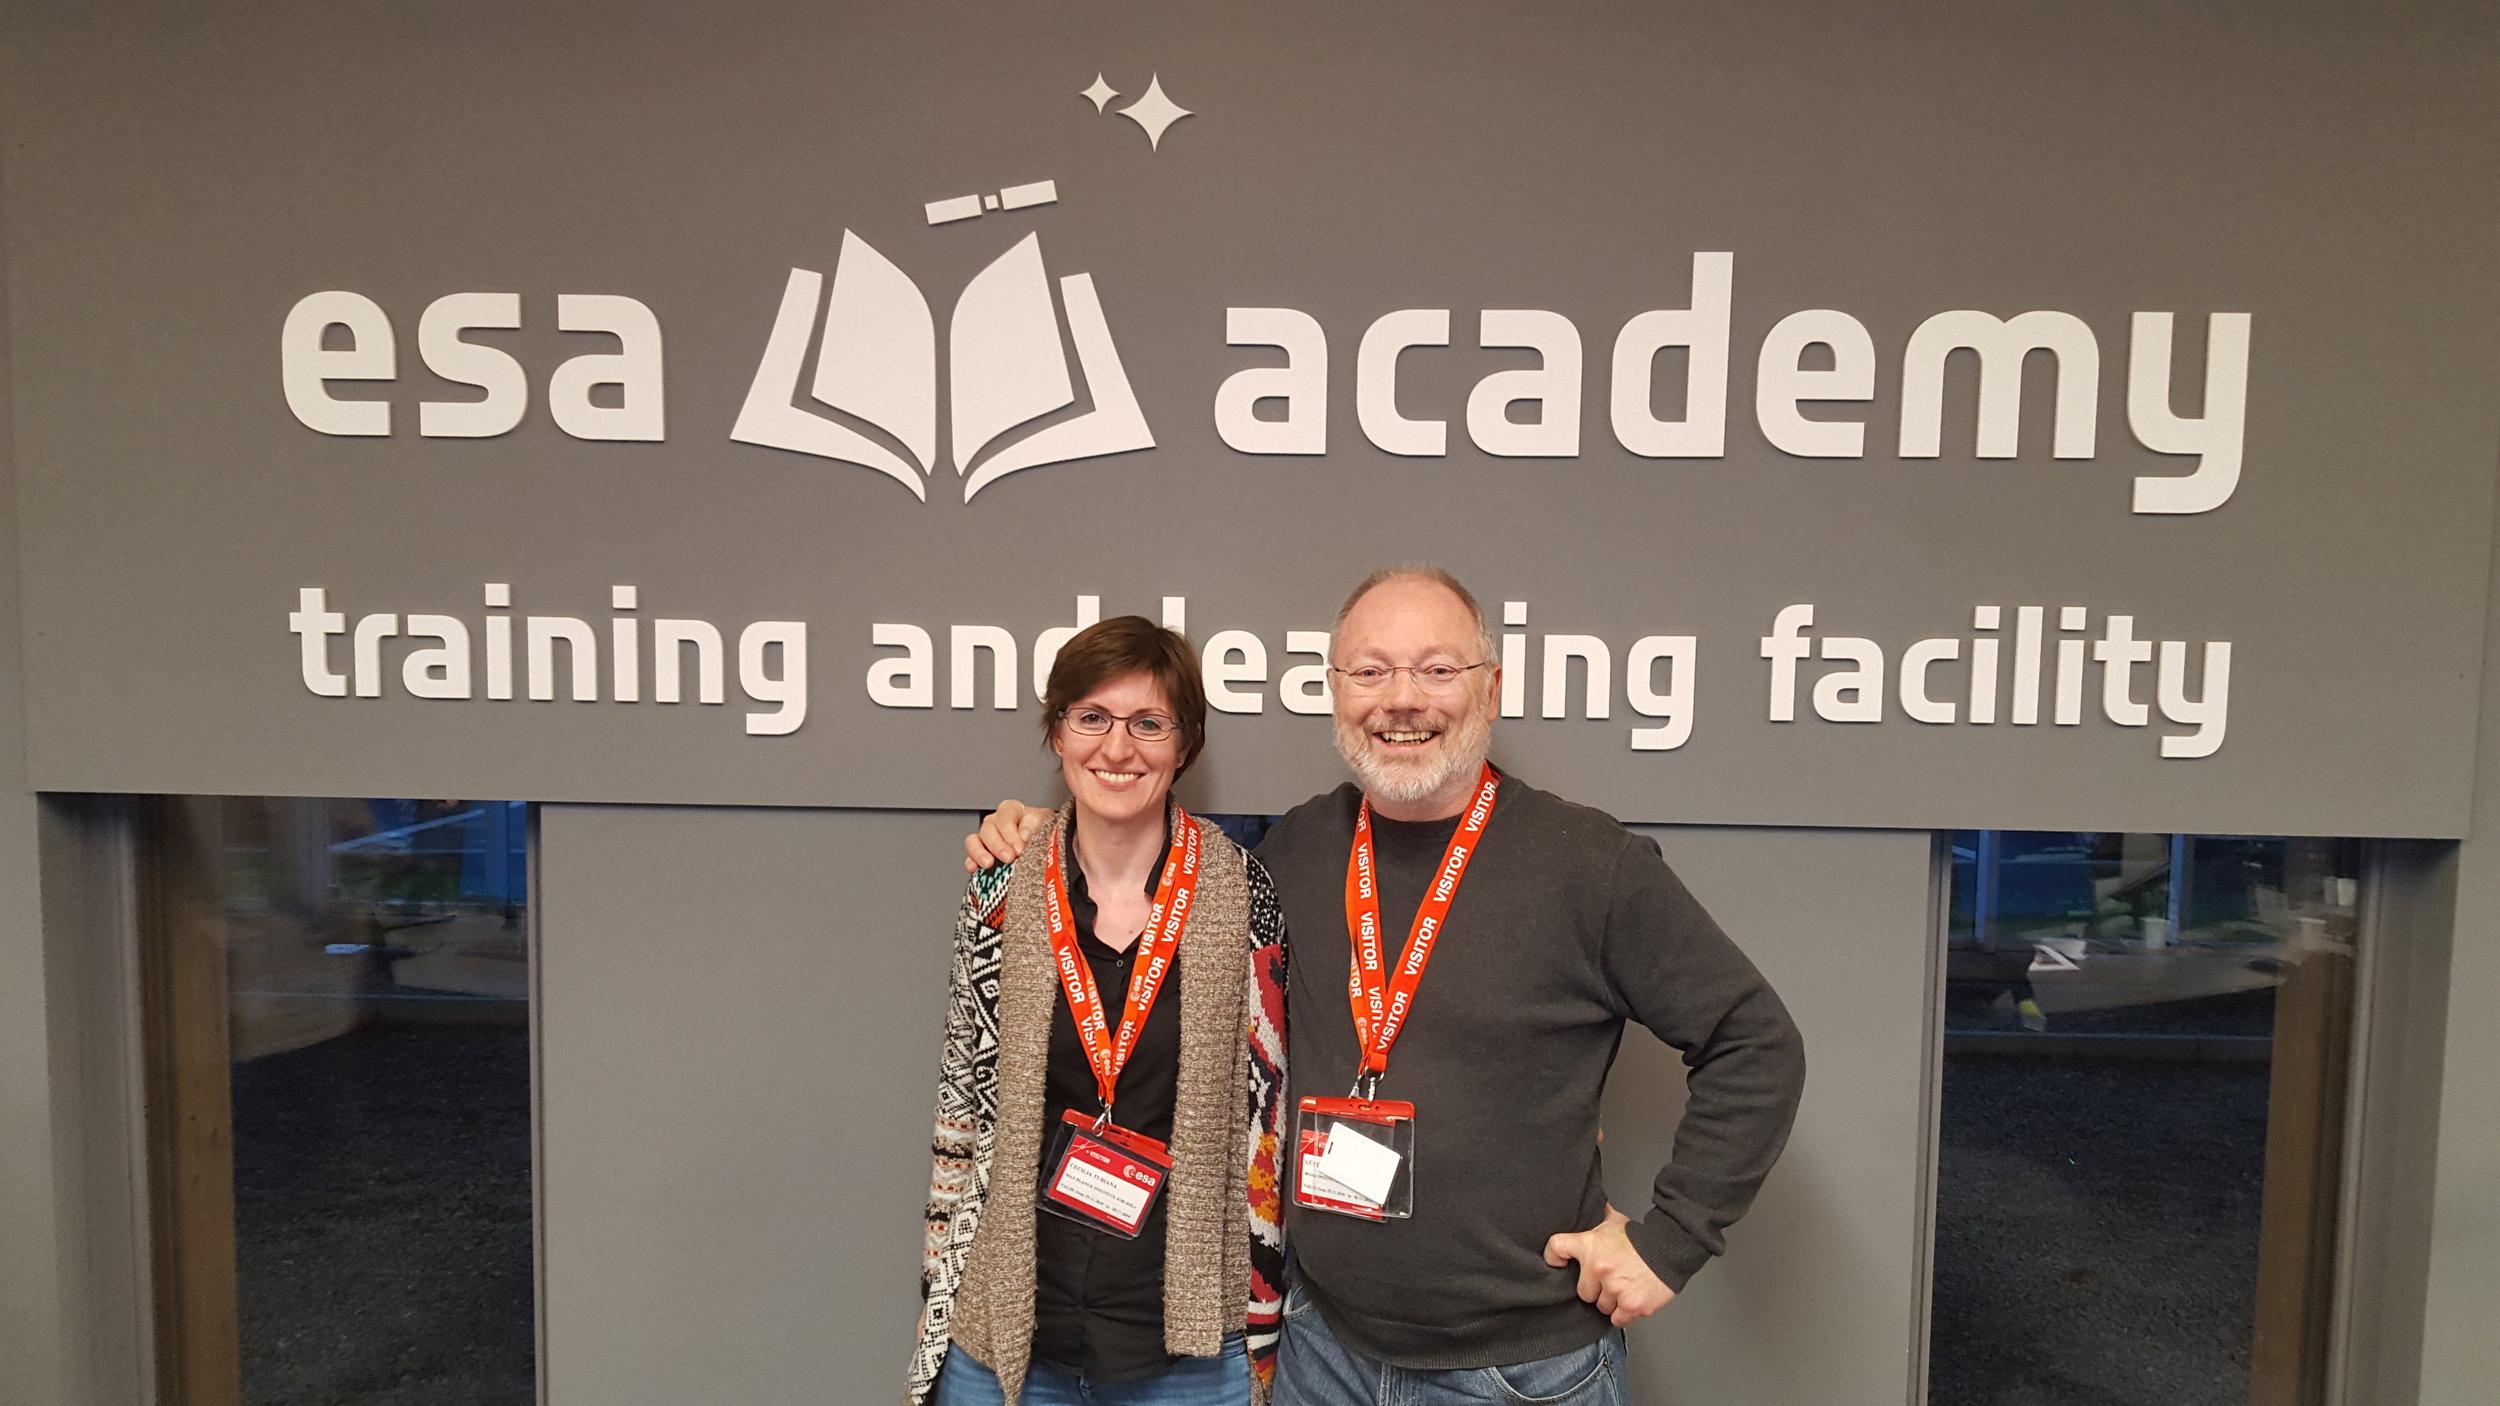 Our valiant tutors, Cecilia Tubiana and Günter Kargl.